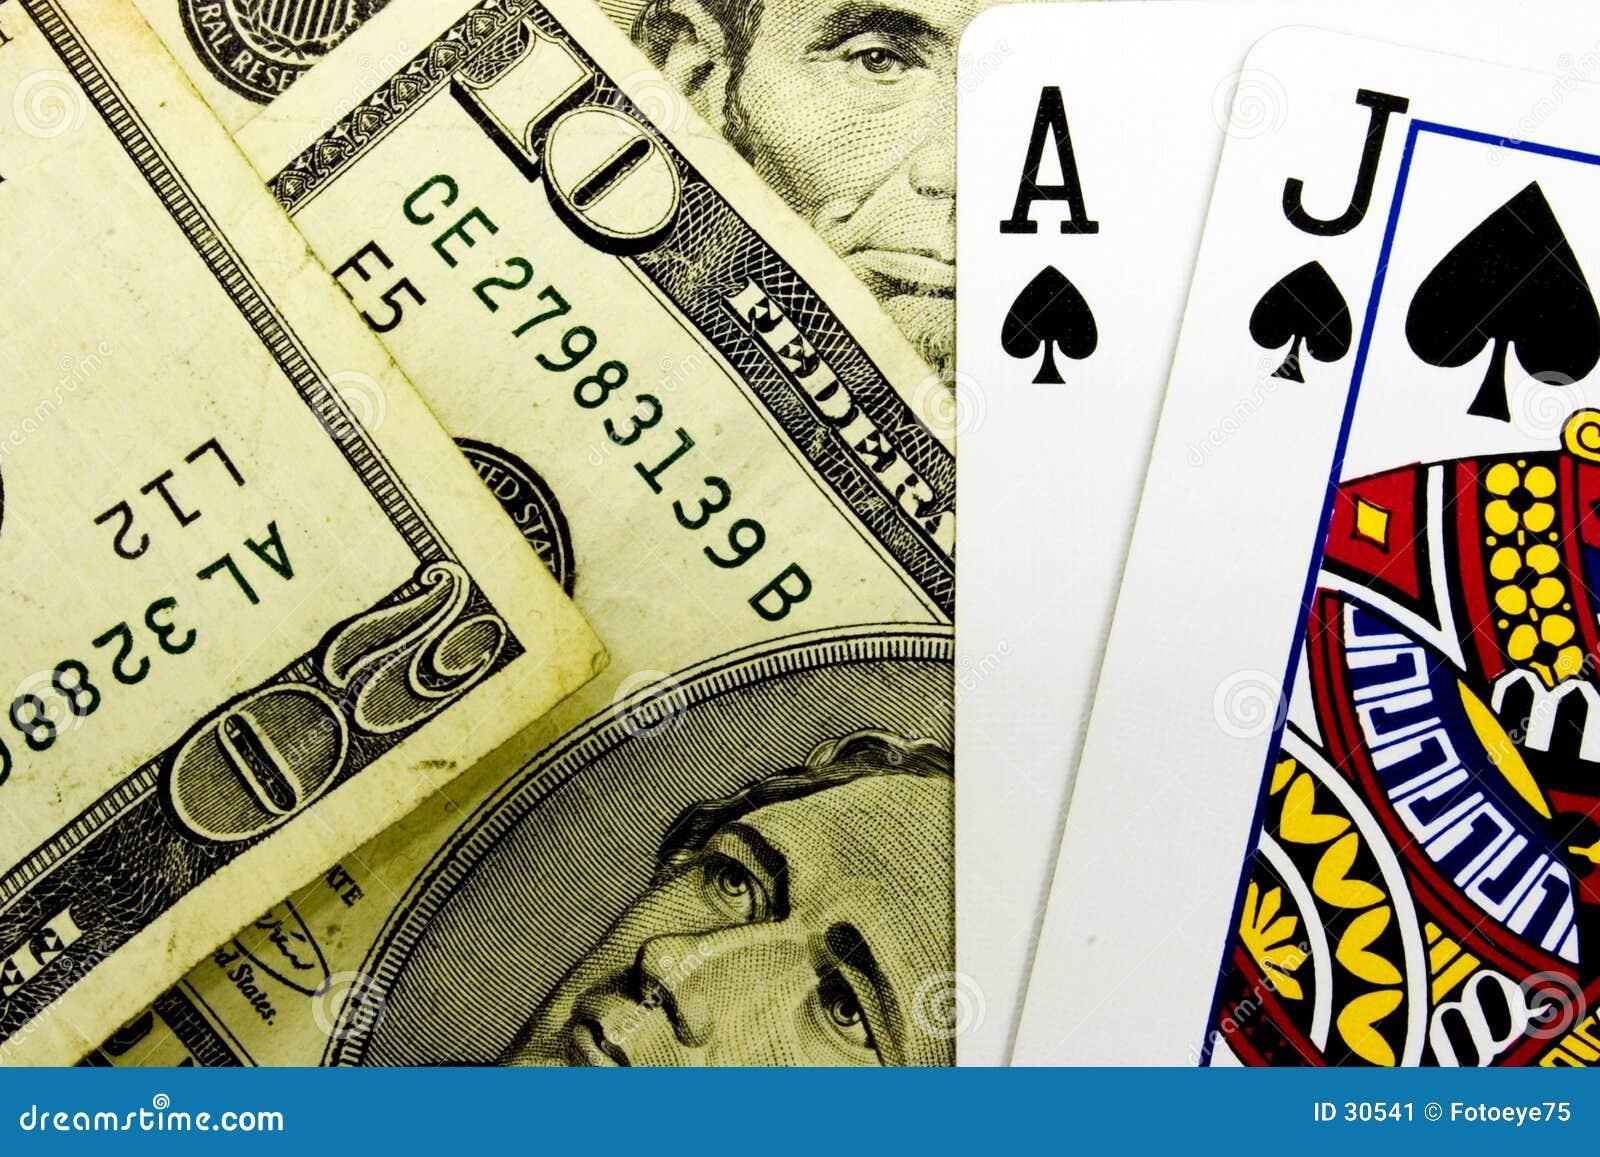 Casino Blackjack Poker Cards and Money